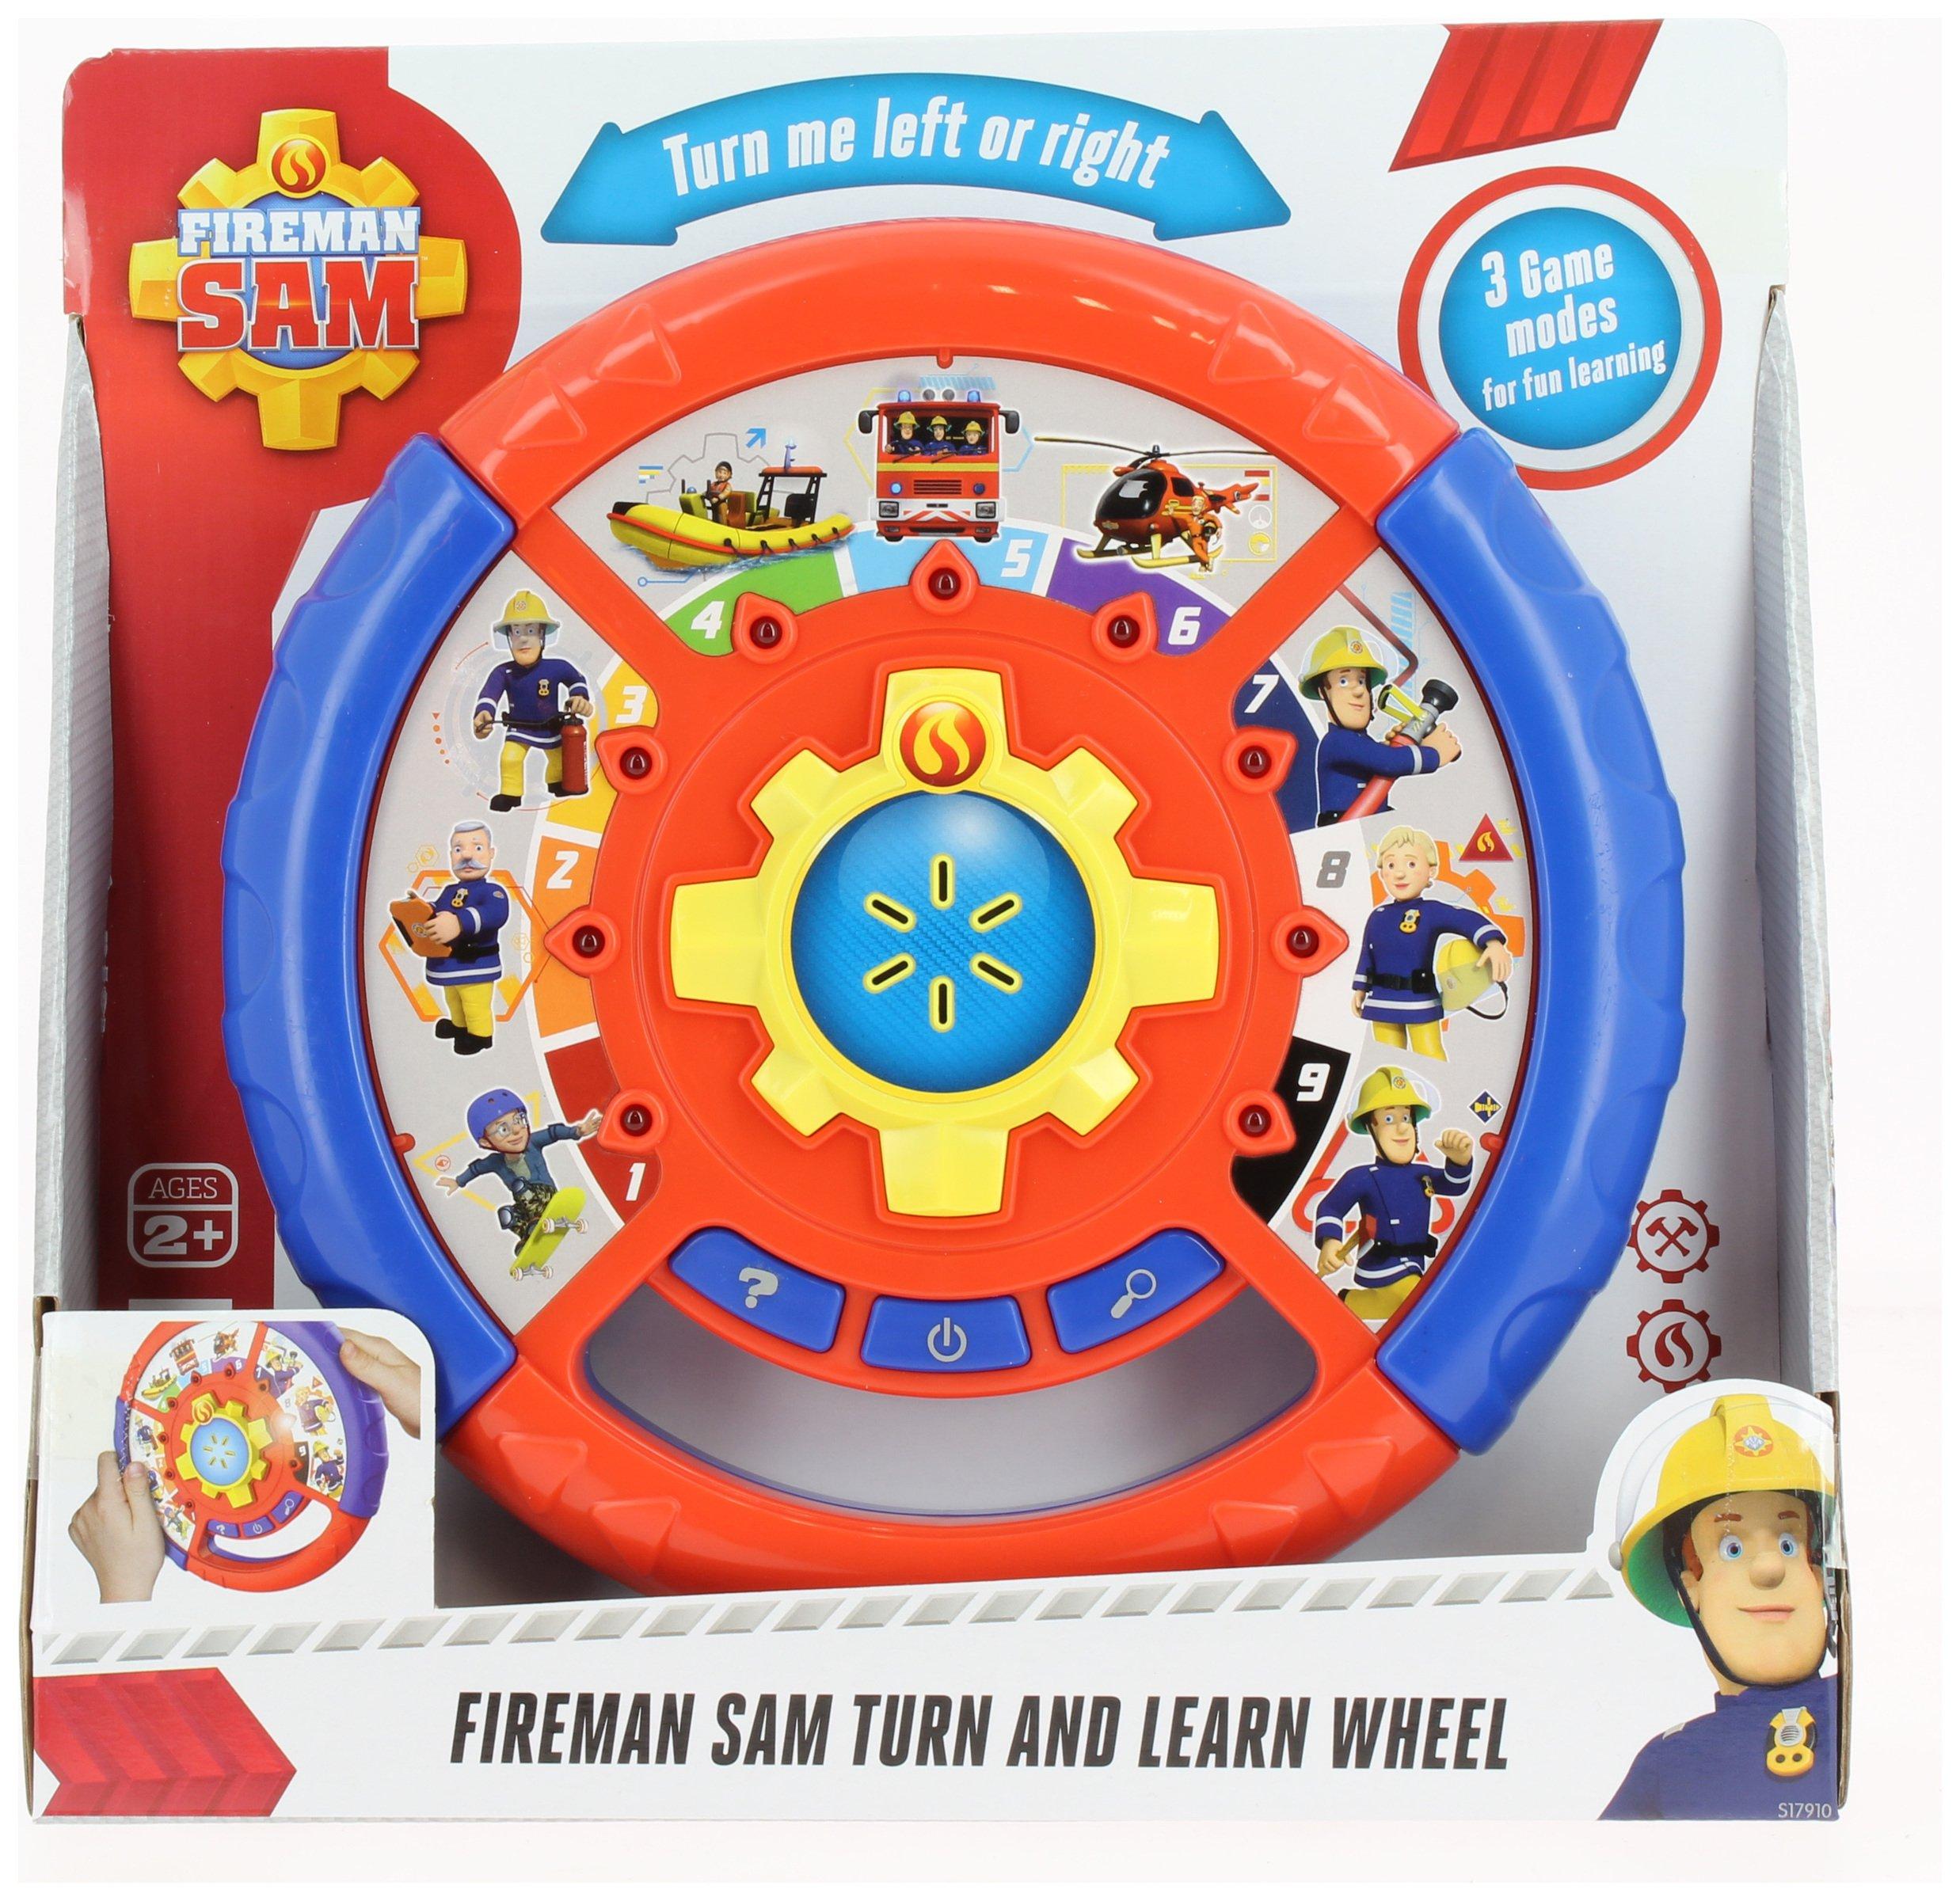 Fireman Sam Turn and Learn Wheel.